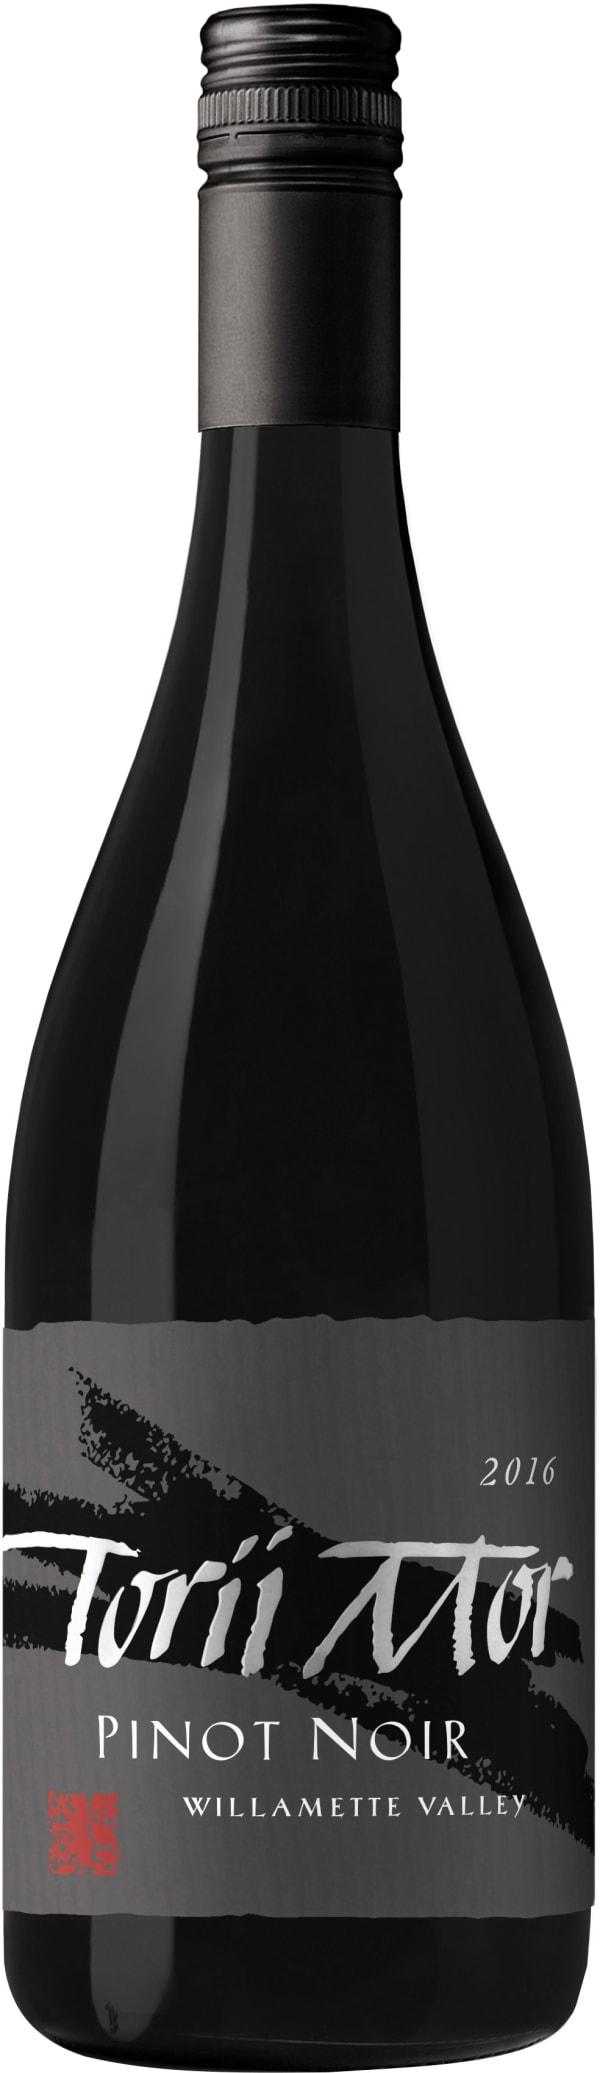 Torii Mor Pinot Noir 2015